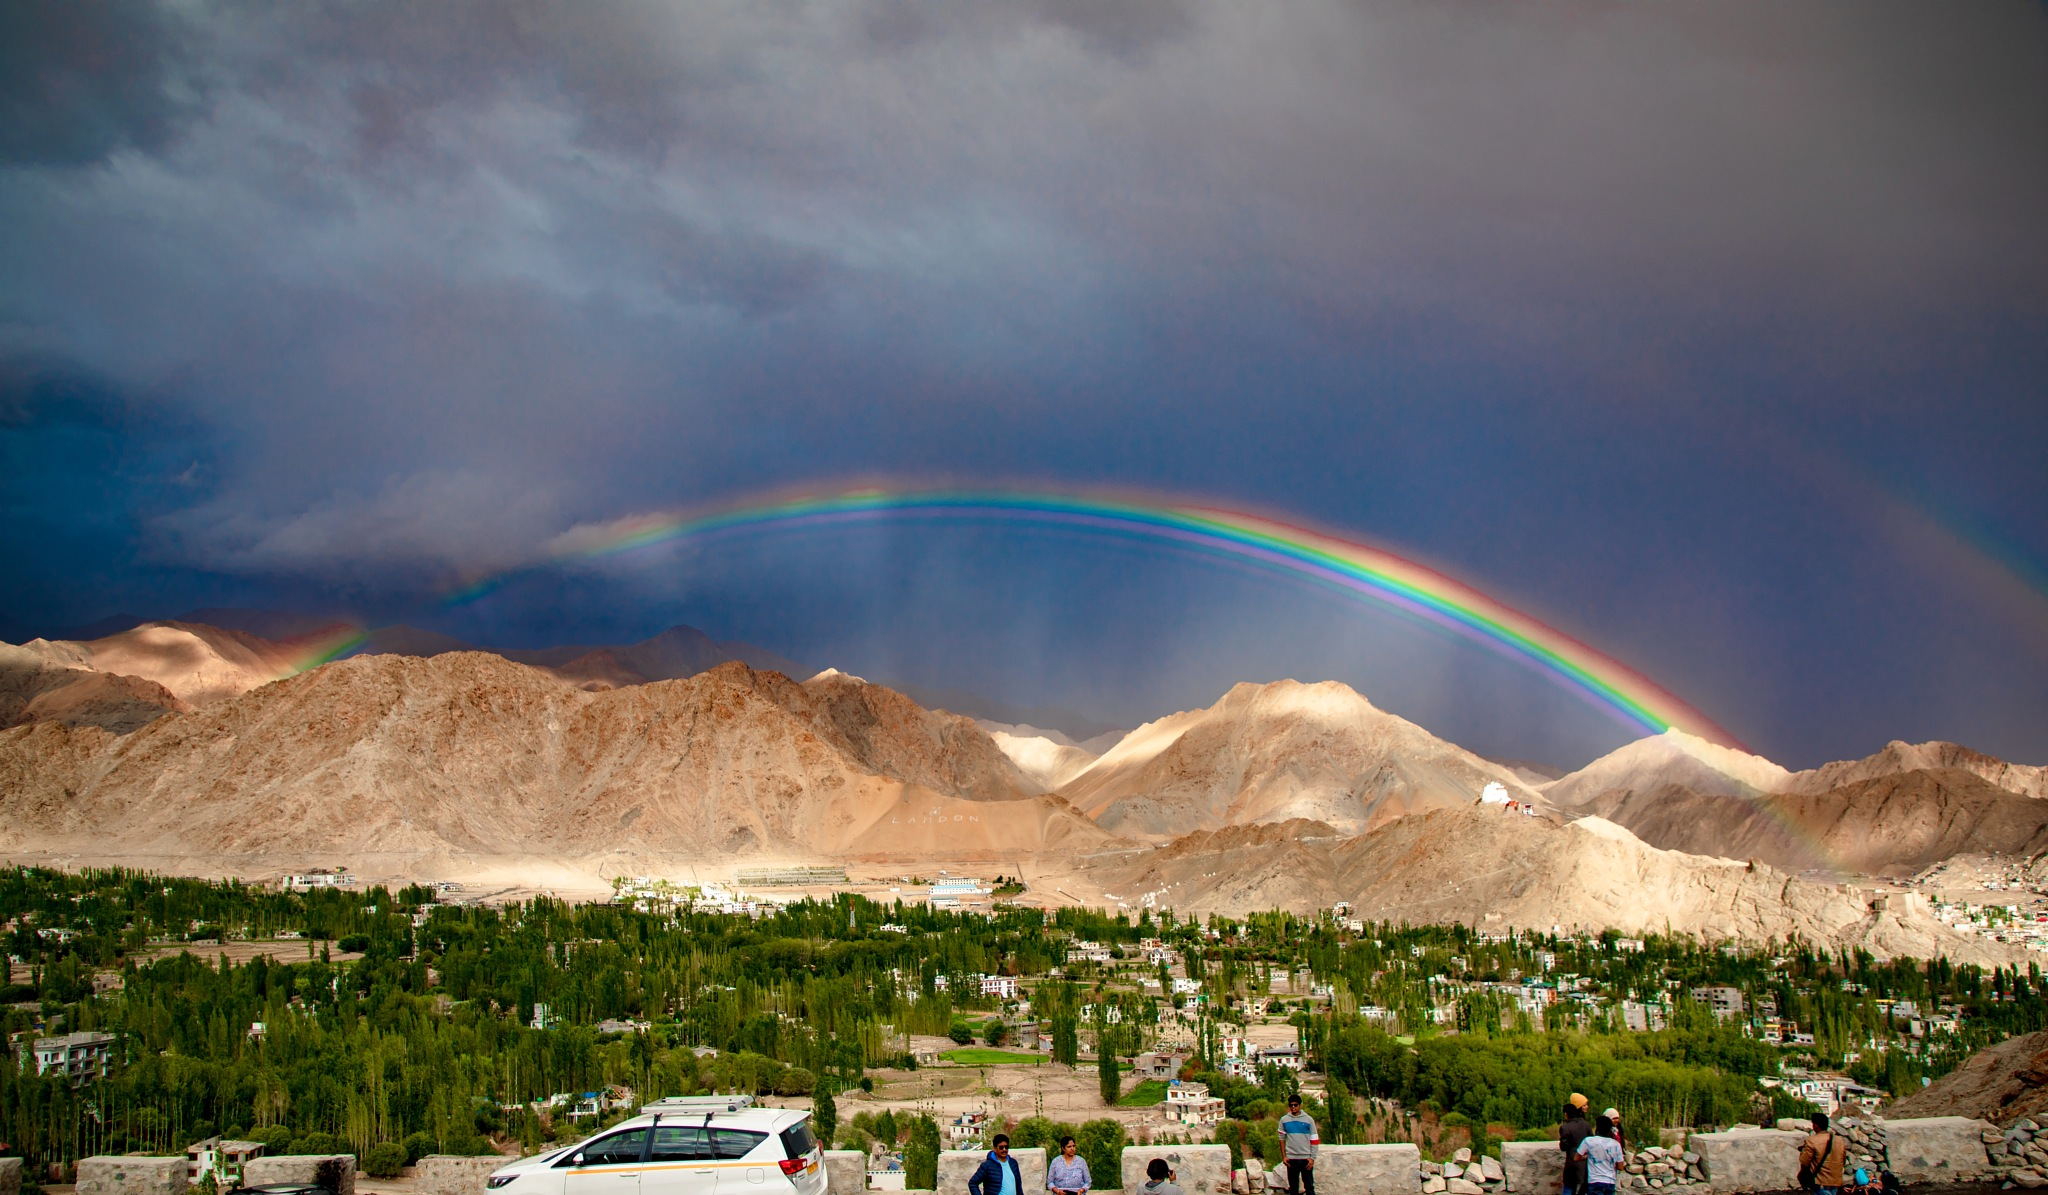 Rainbow by Pelican